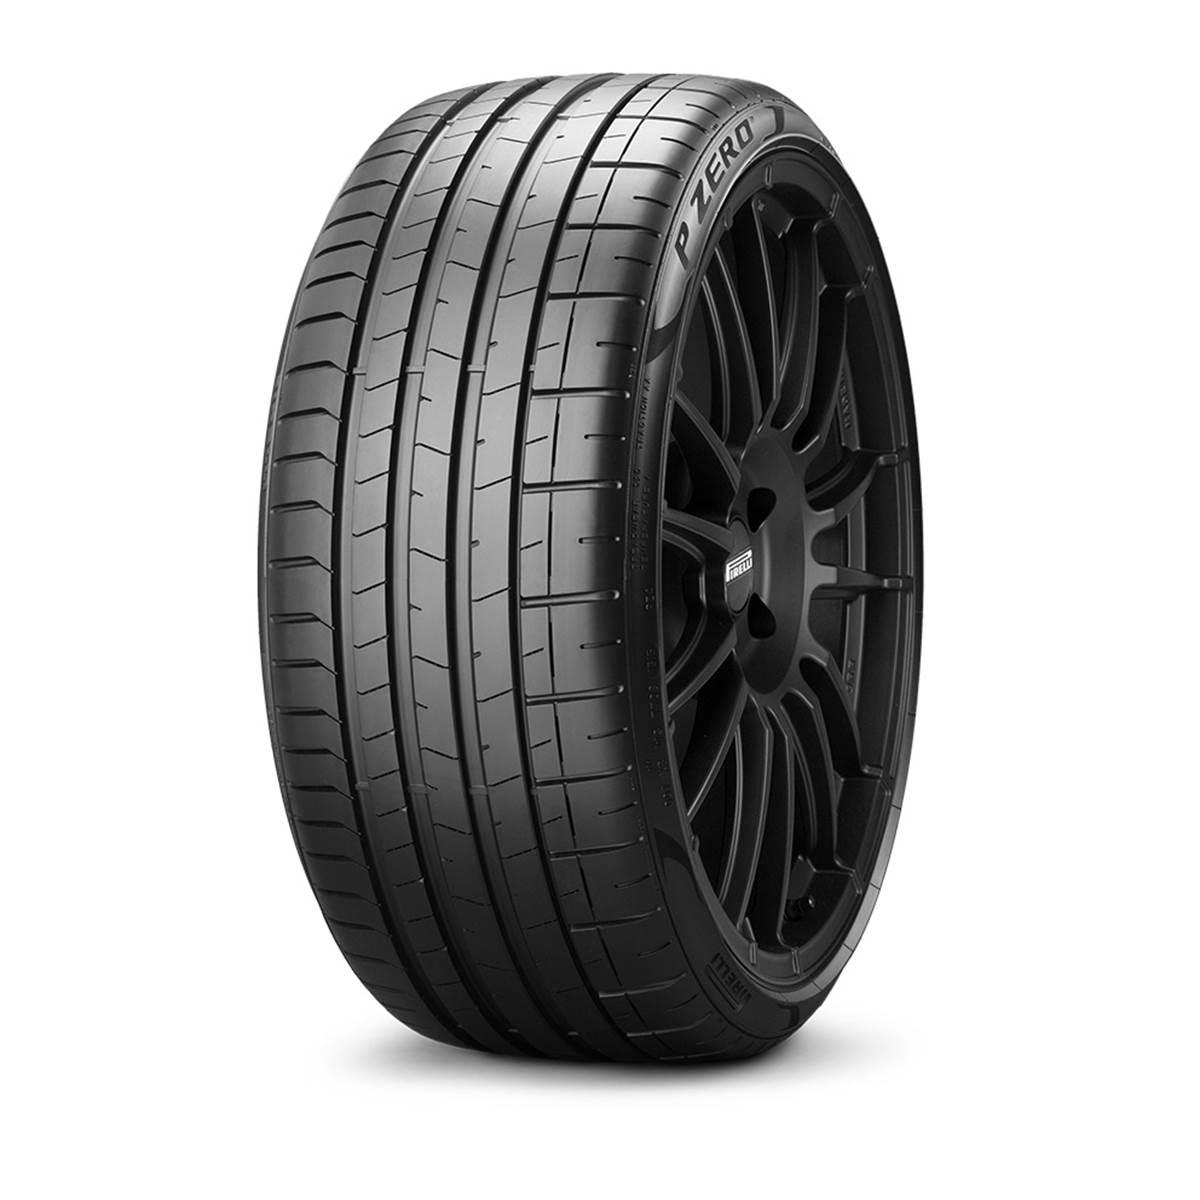 Pneu Pirelli 235/45R18 94Y P-Zero homologué Porsche